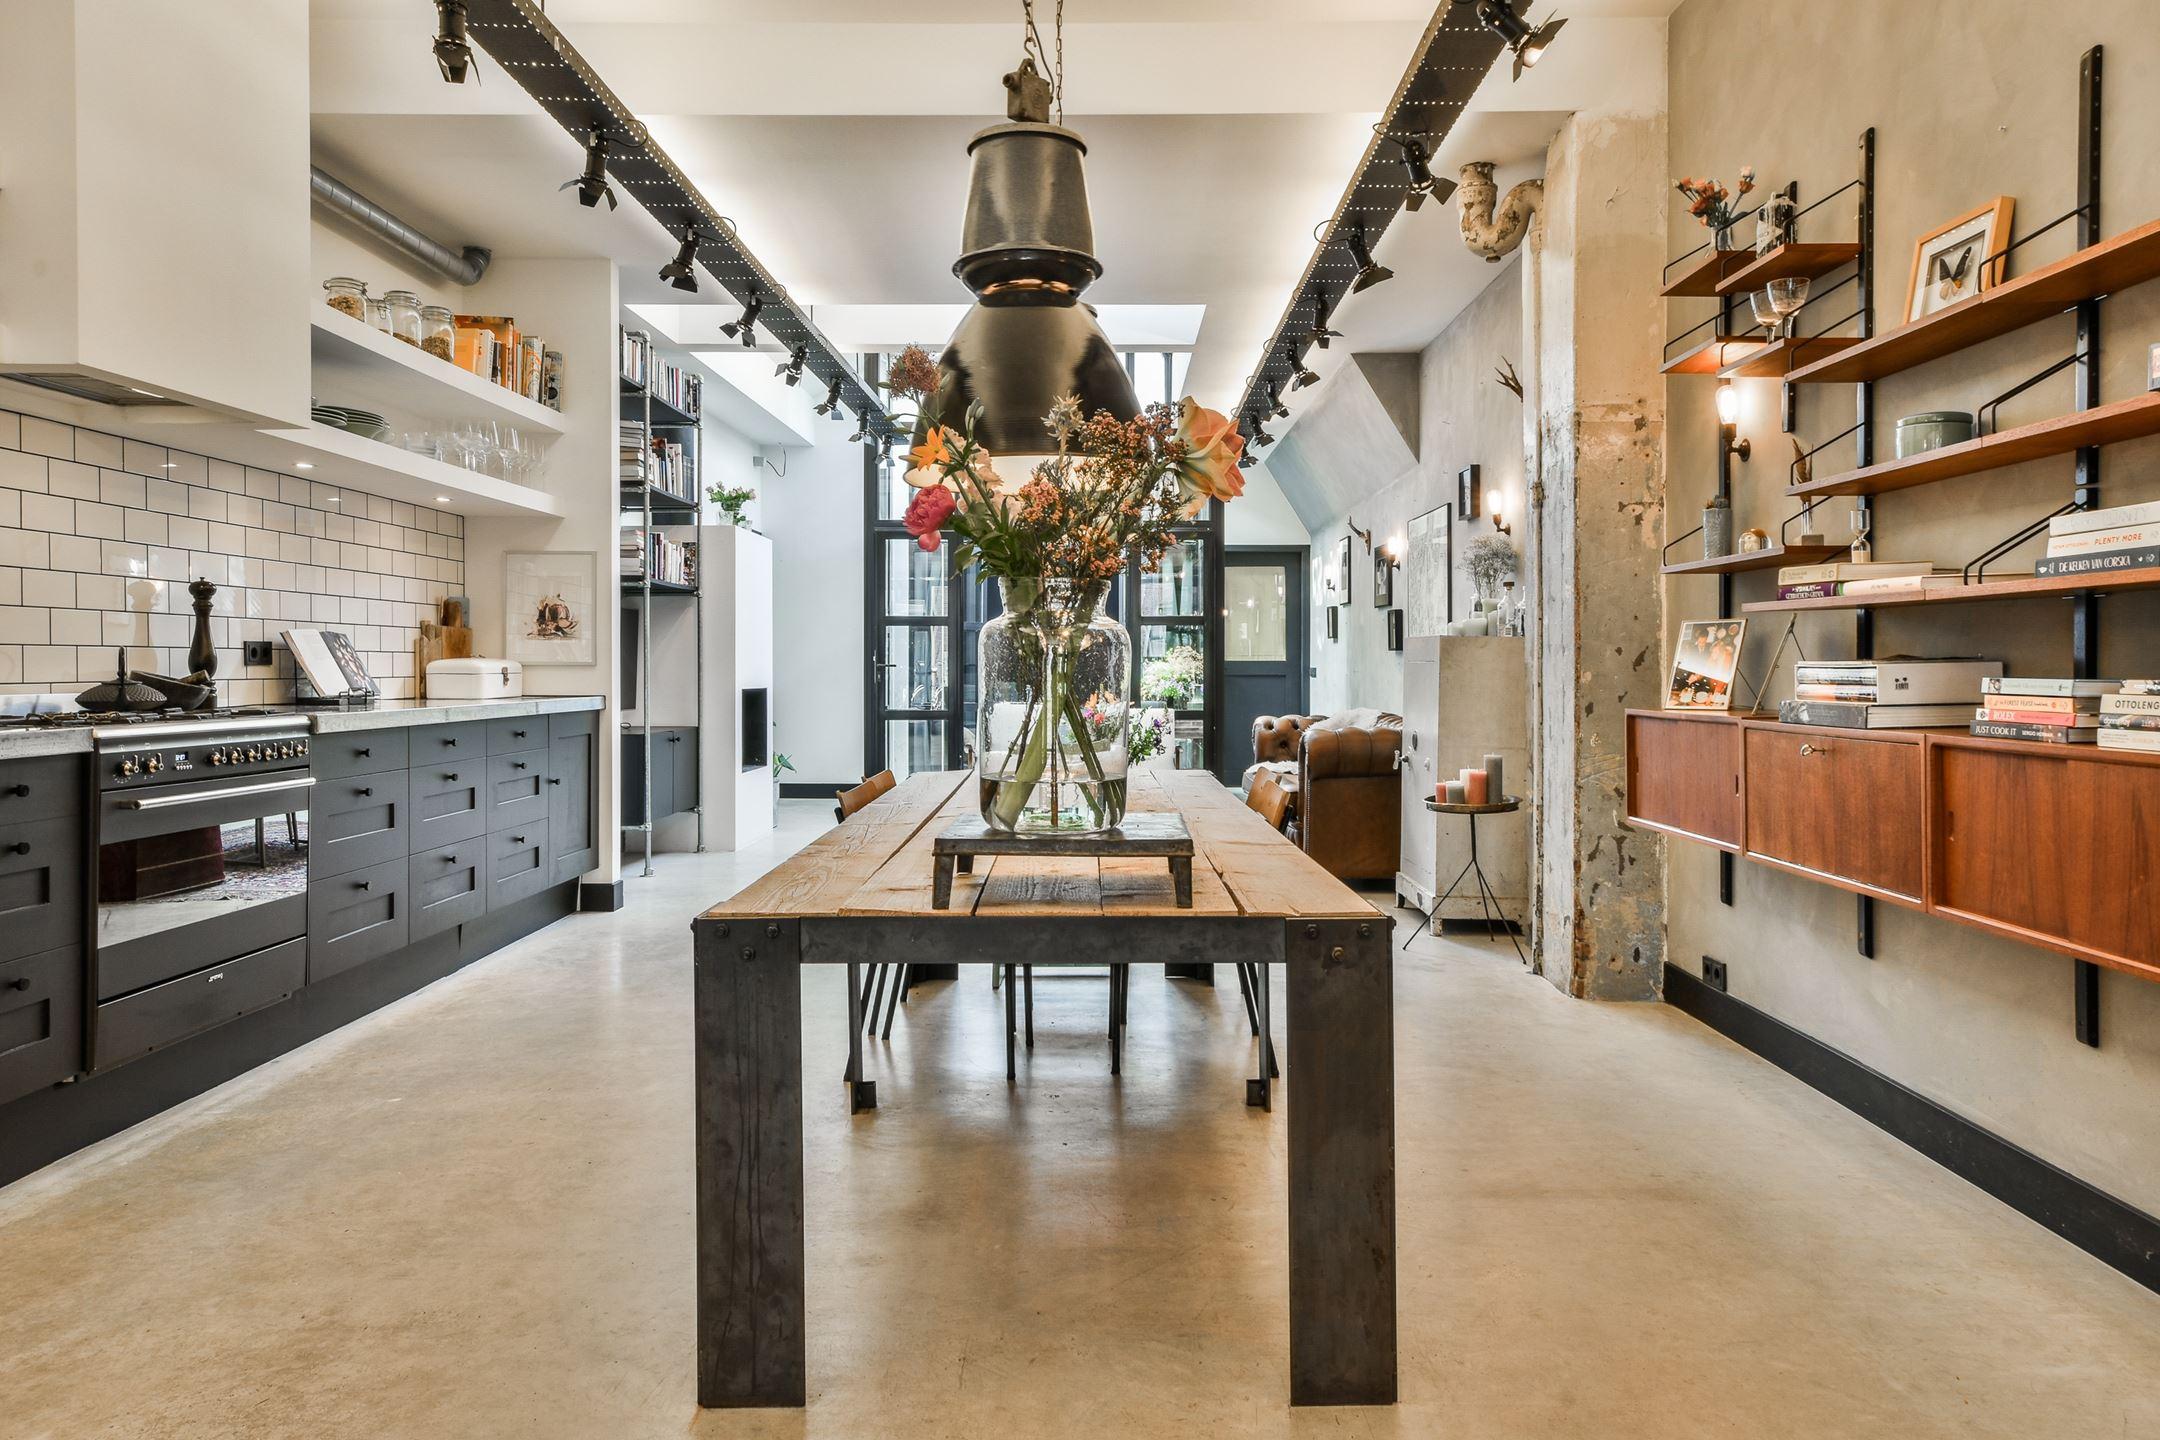 The Nordroom - Garage Conversion Amsterdam6.jpg